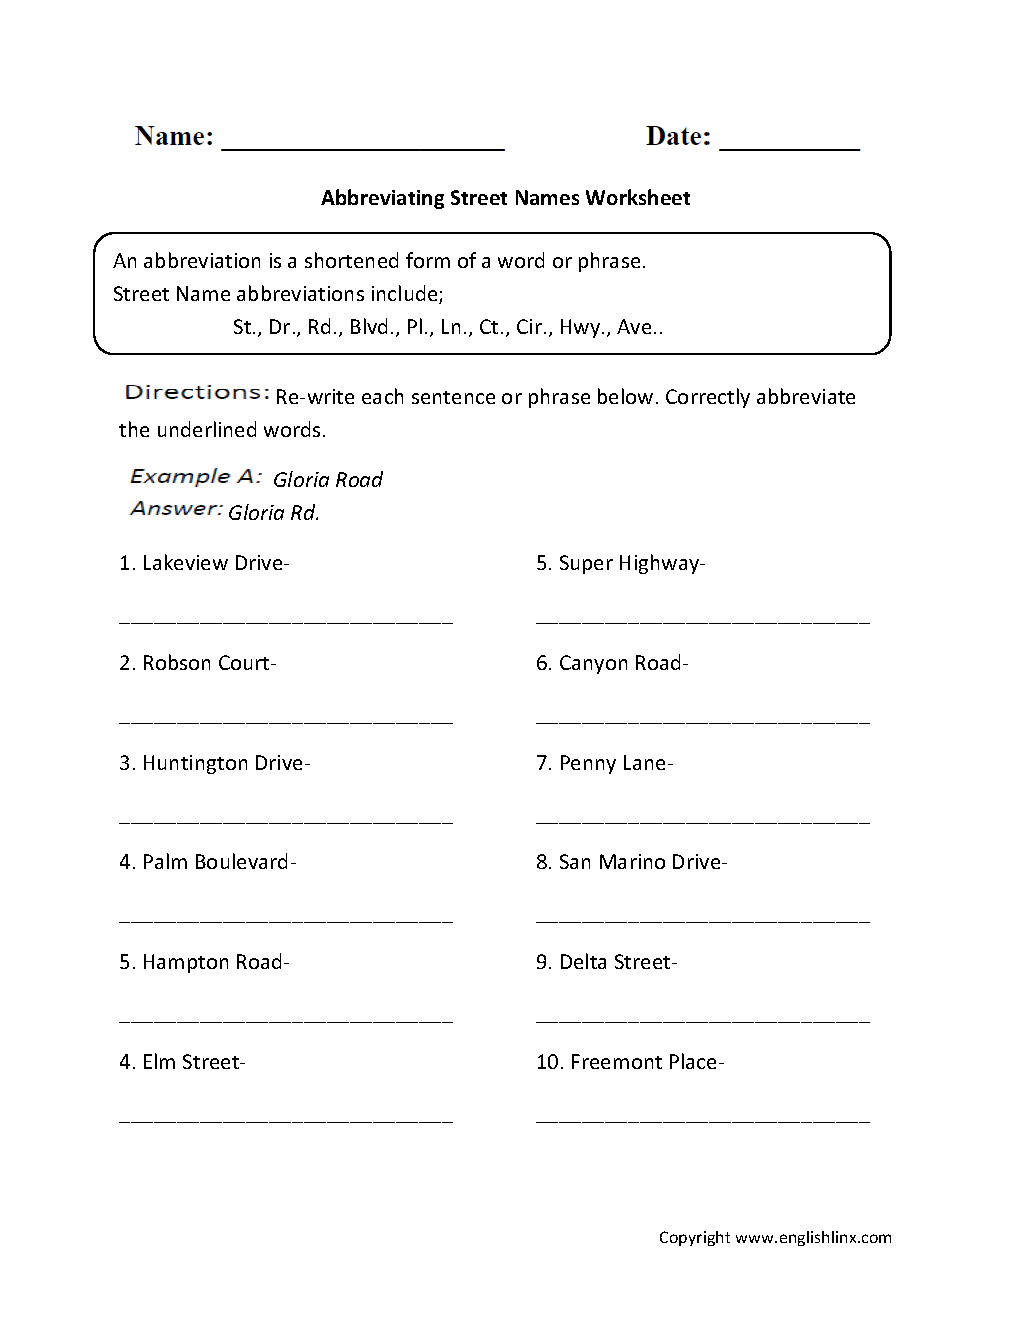 hight resolution of Englishlinx.com   Abbreviations Worksheets   2nd grade worksheets